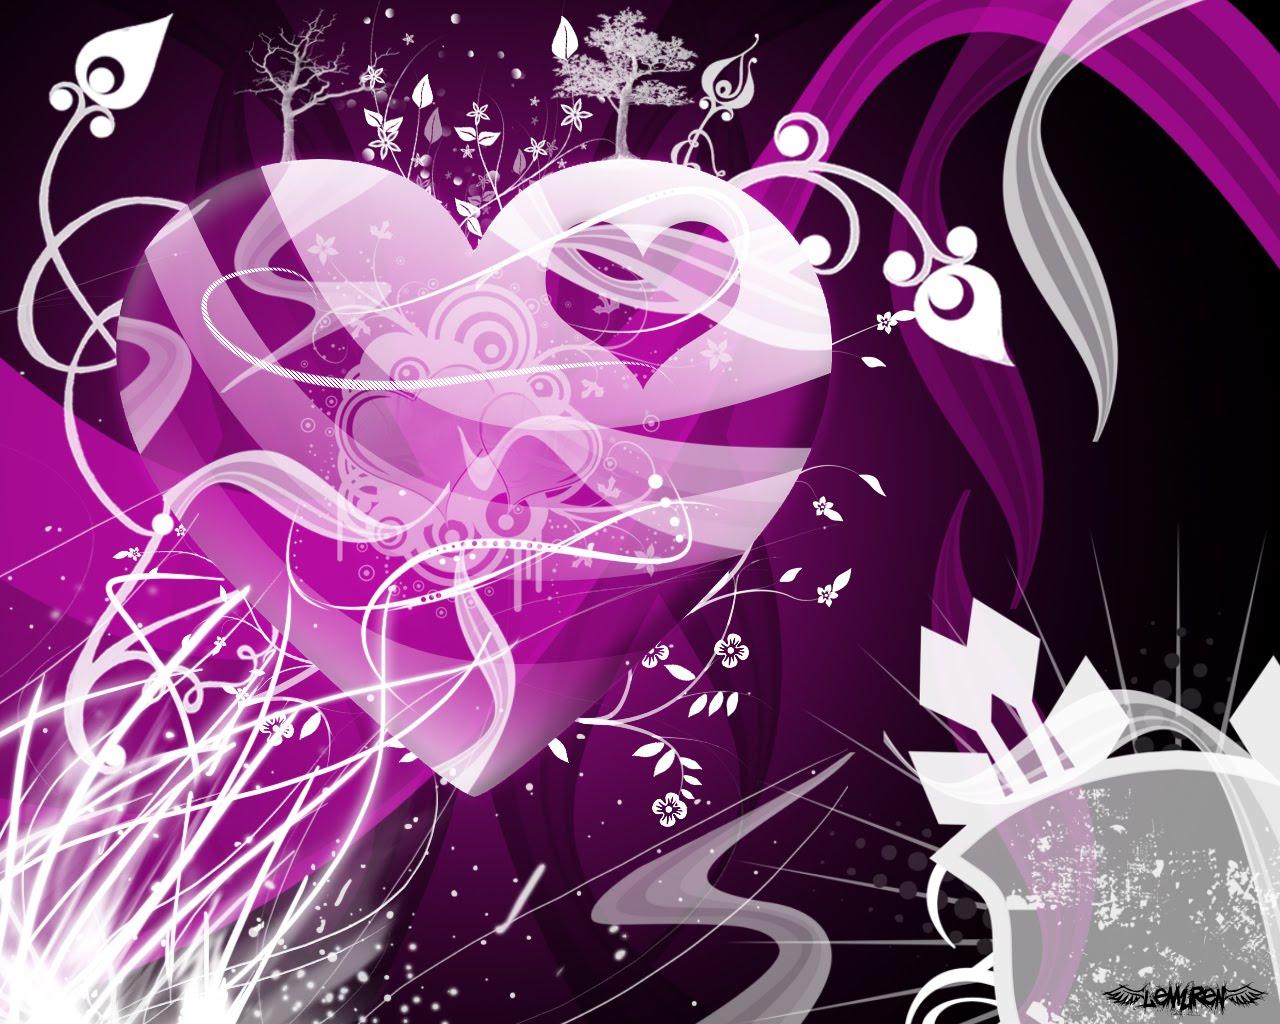 Banco de im genes im genes de amor viii corazones - Y k love wallpaper ...